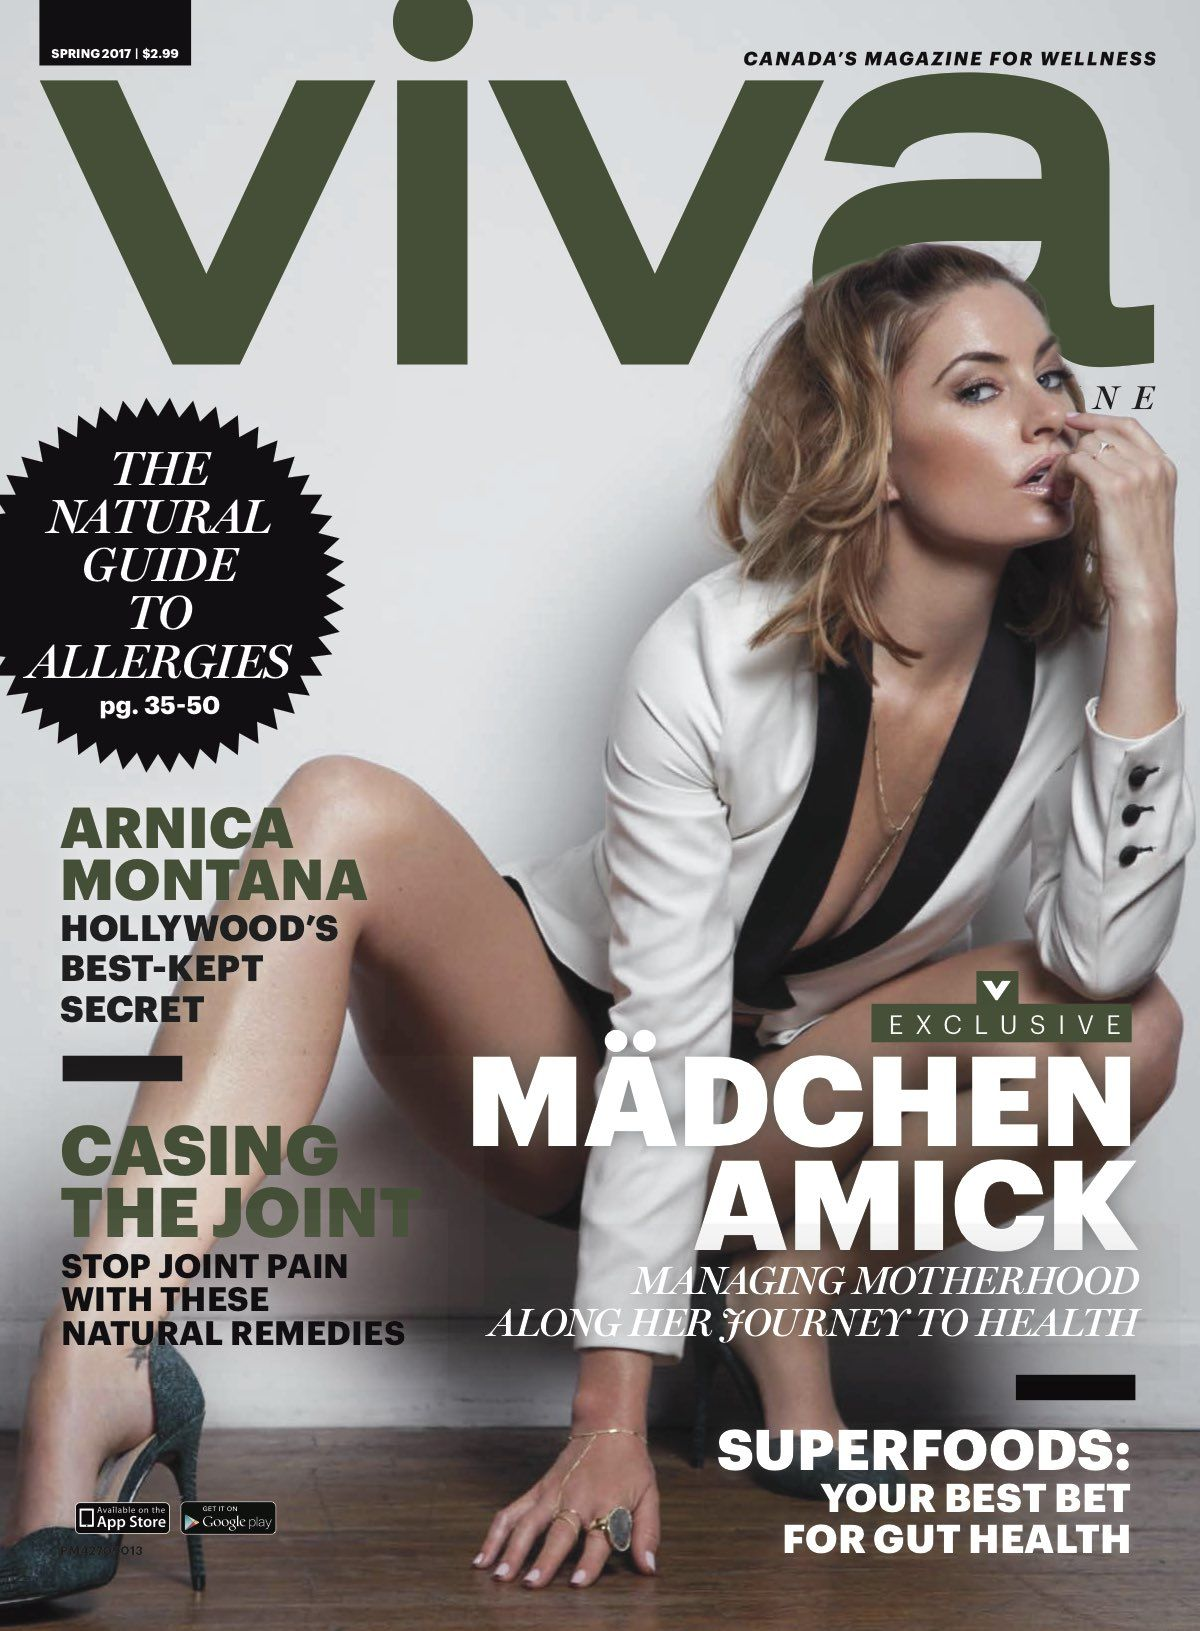 MADCHEN AMICK for Viva Magazine, Spring 2017